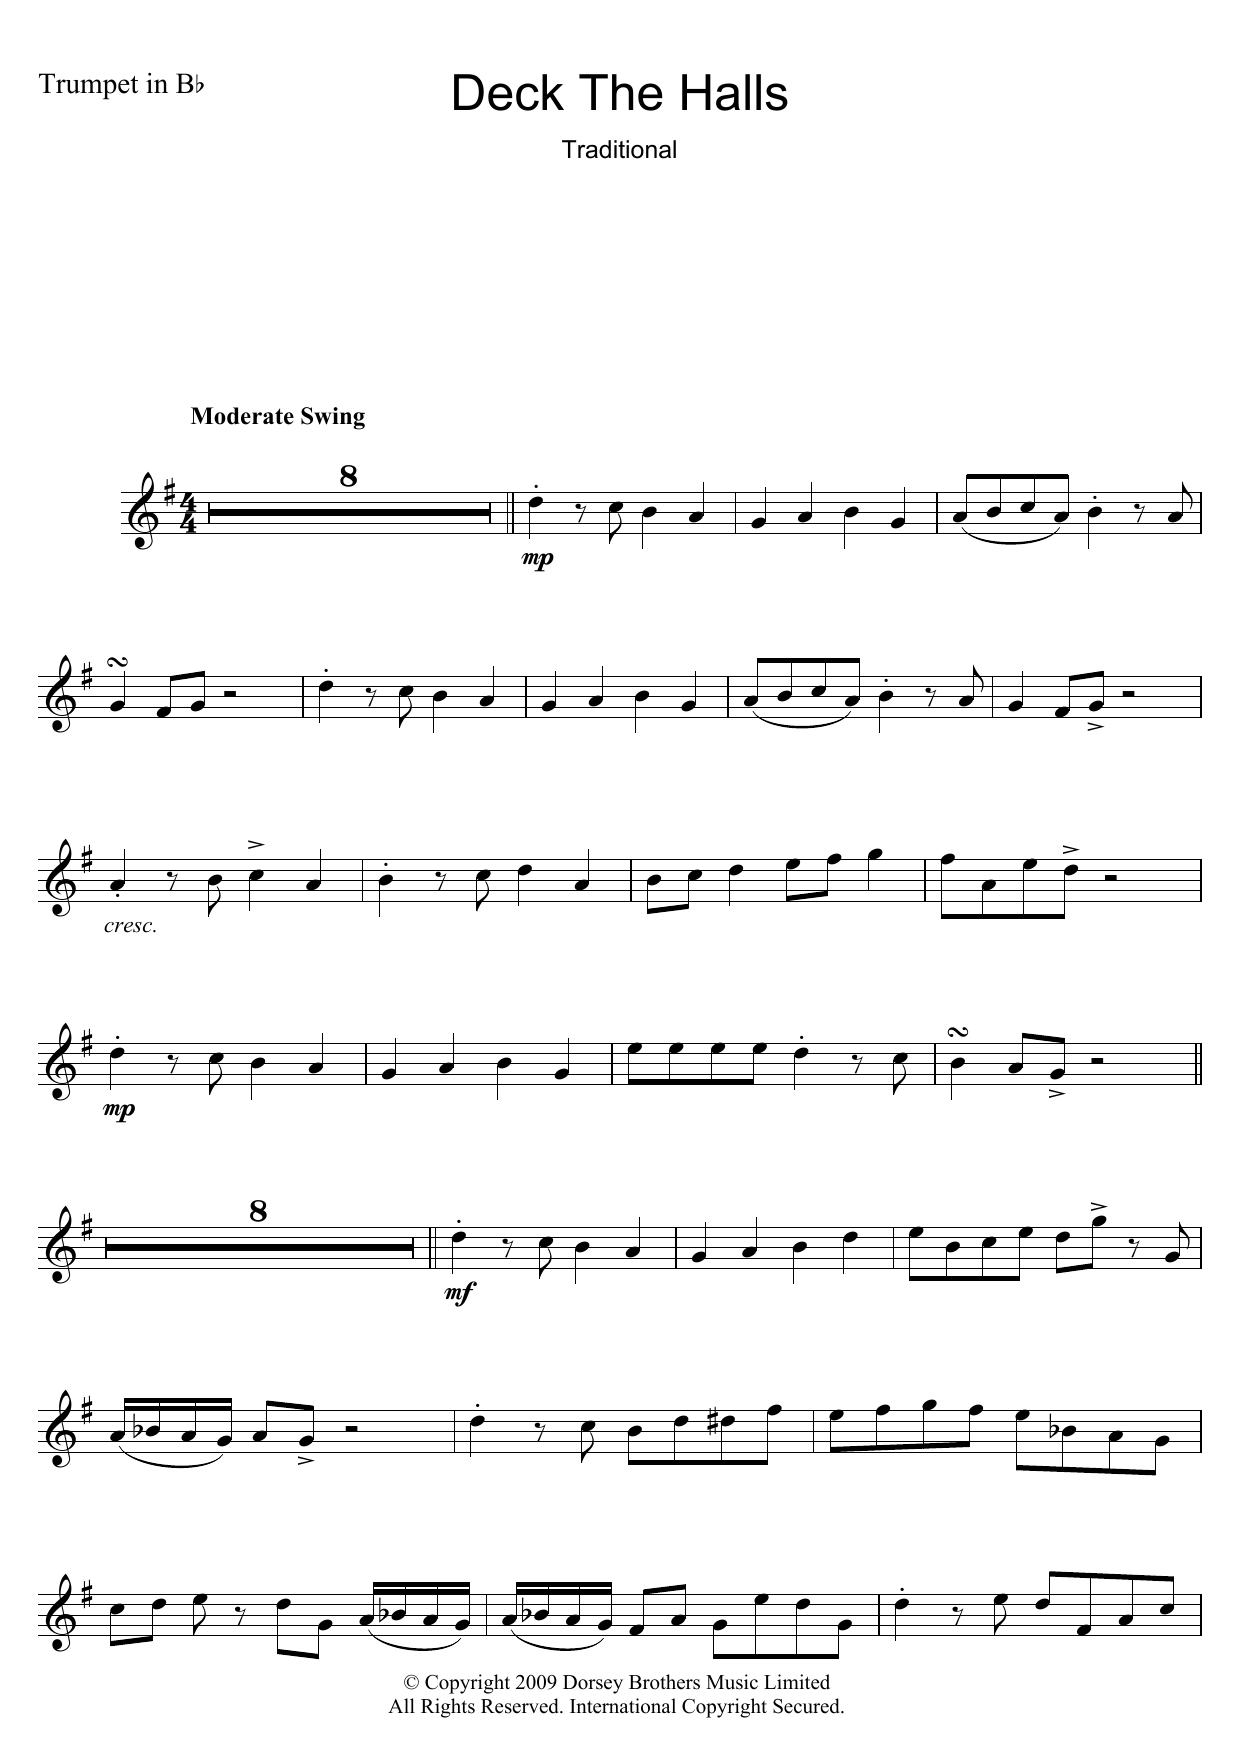 Christmas Carol Deck The Halls sheet music notes and chords. Download Printable PDF.